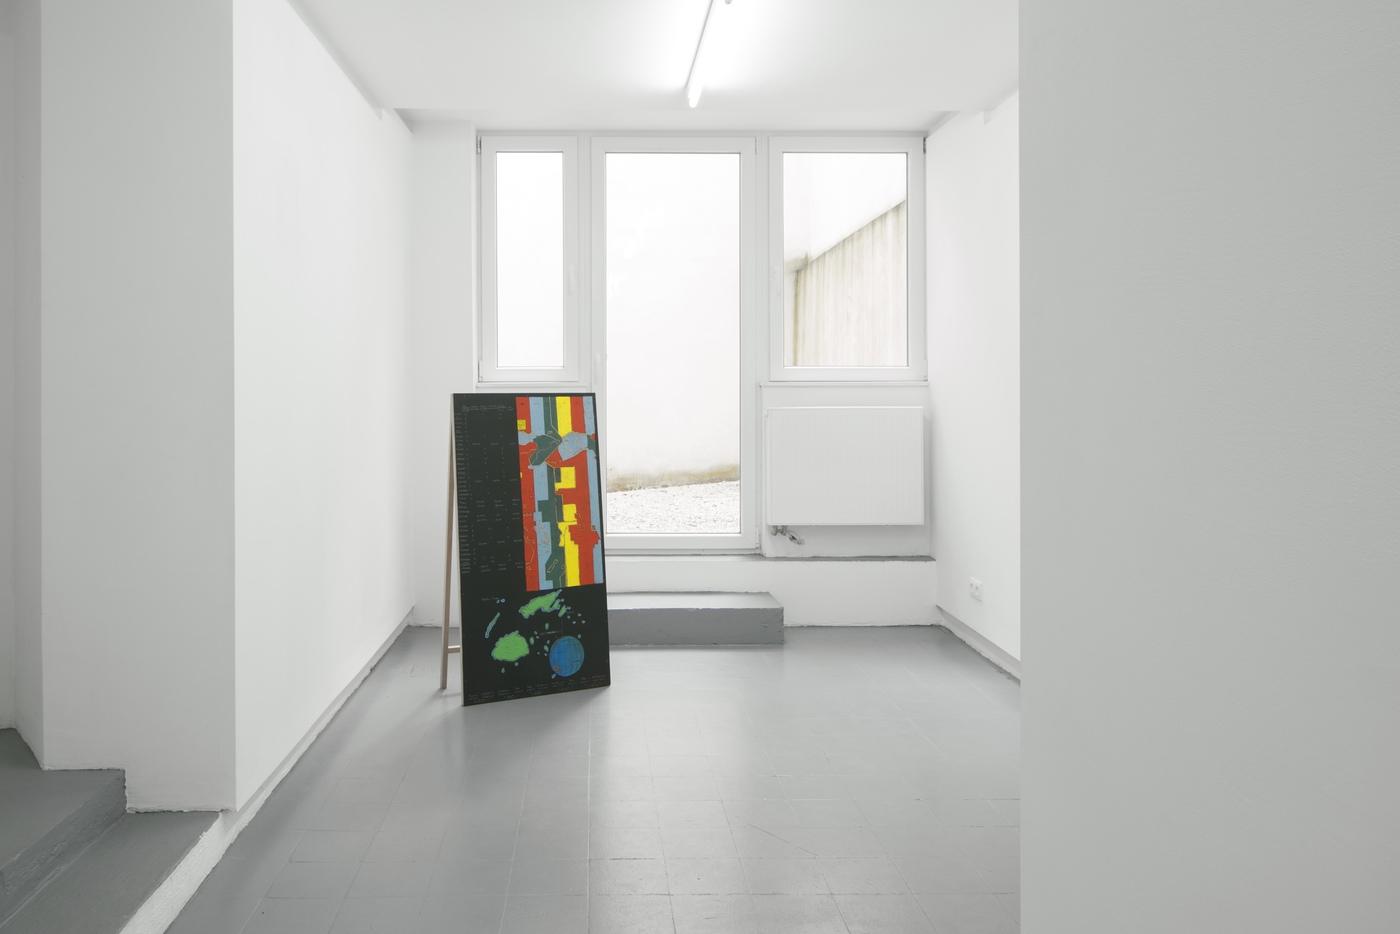 Raffaella Crispino_Tokyo-San Francisco_installation view 4